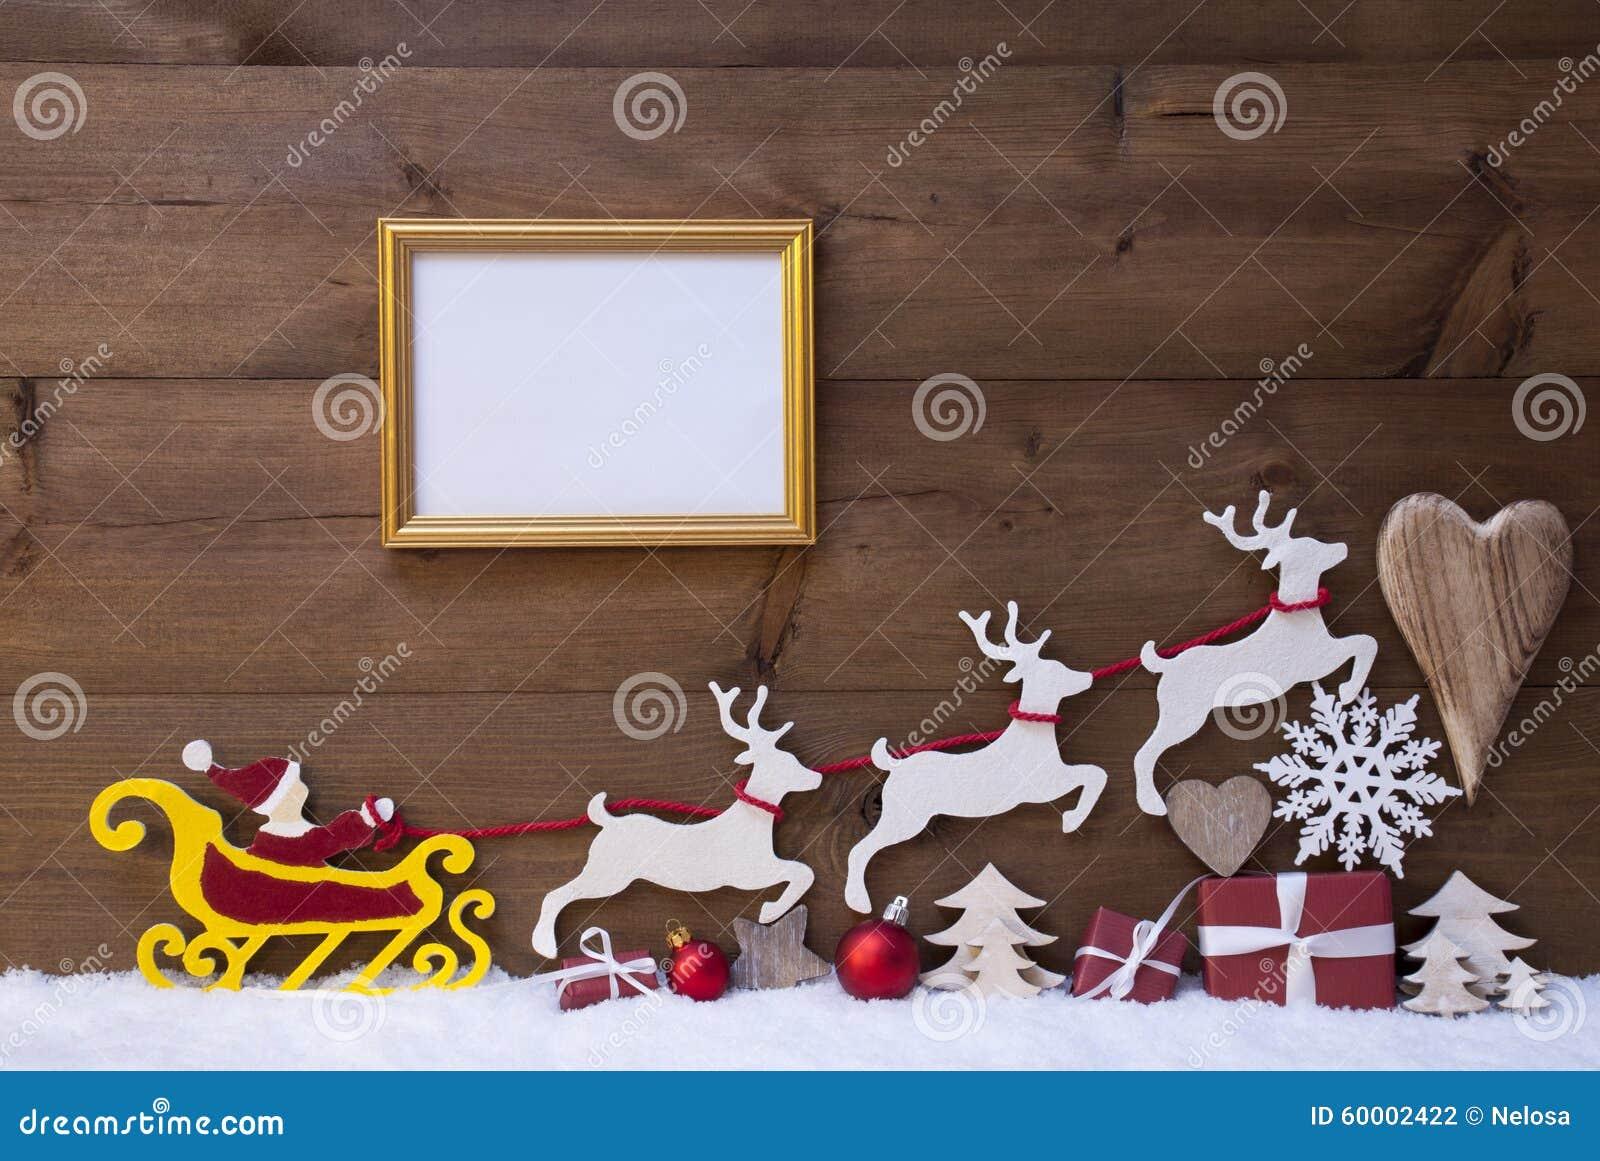 Christmas Santa Sleigh Reindeer Decoration  from thumbs.dreamstime.com